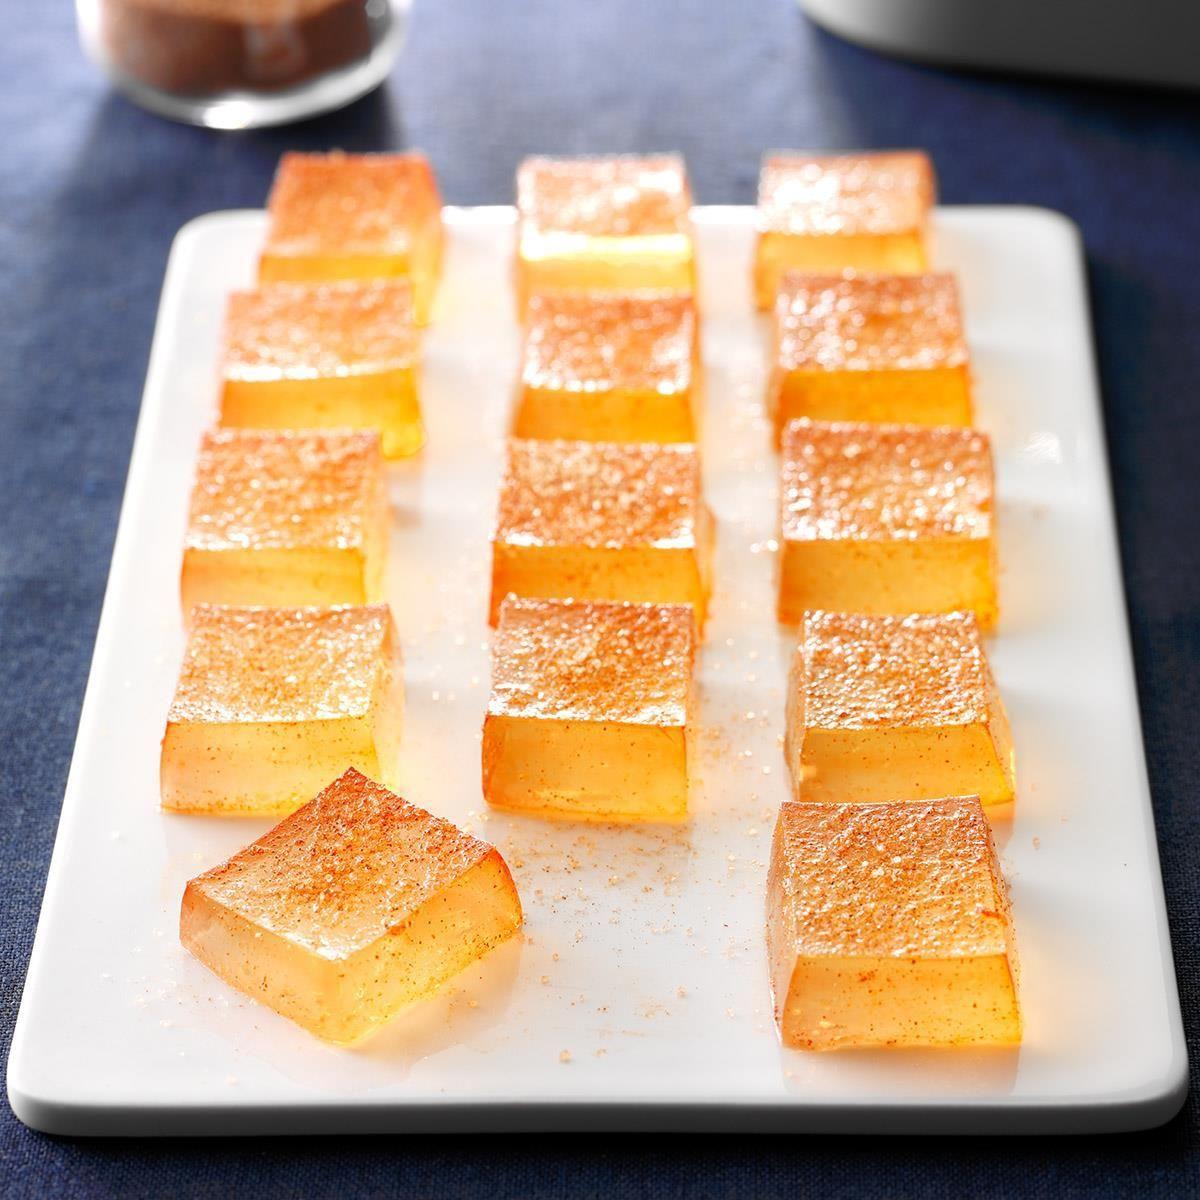 Spiced Apple Cider Jelly Shots #spikedapplecider